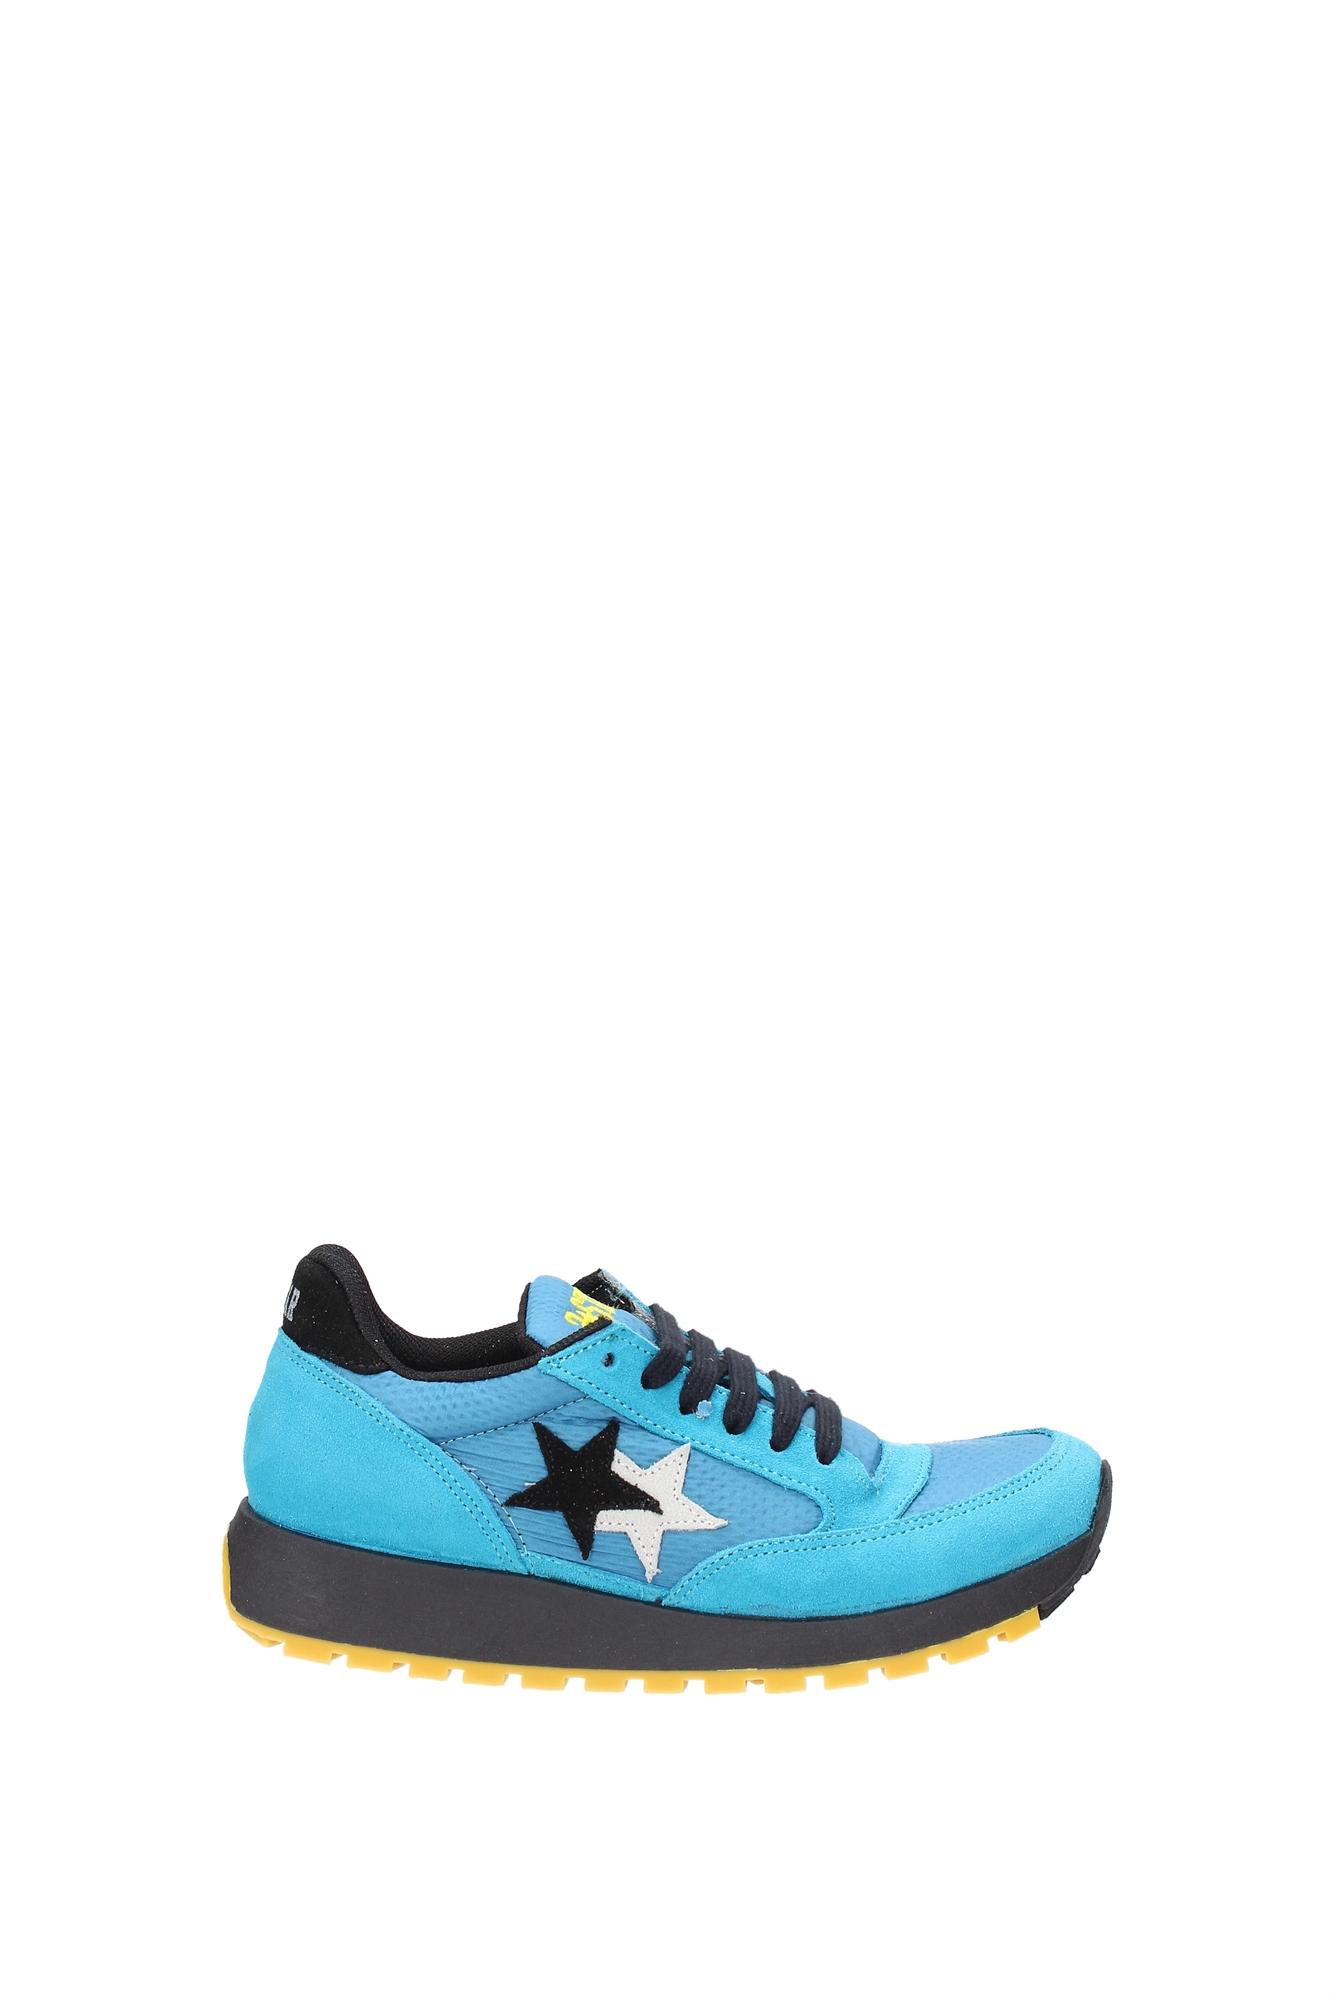 Sneakers 2star 2star Sneakers Damenschuhe - Camoscio (2SD1146TURCHESE) 4fe9f4